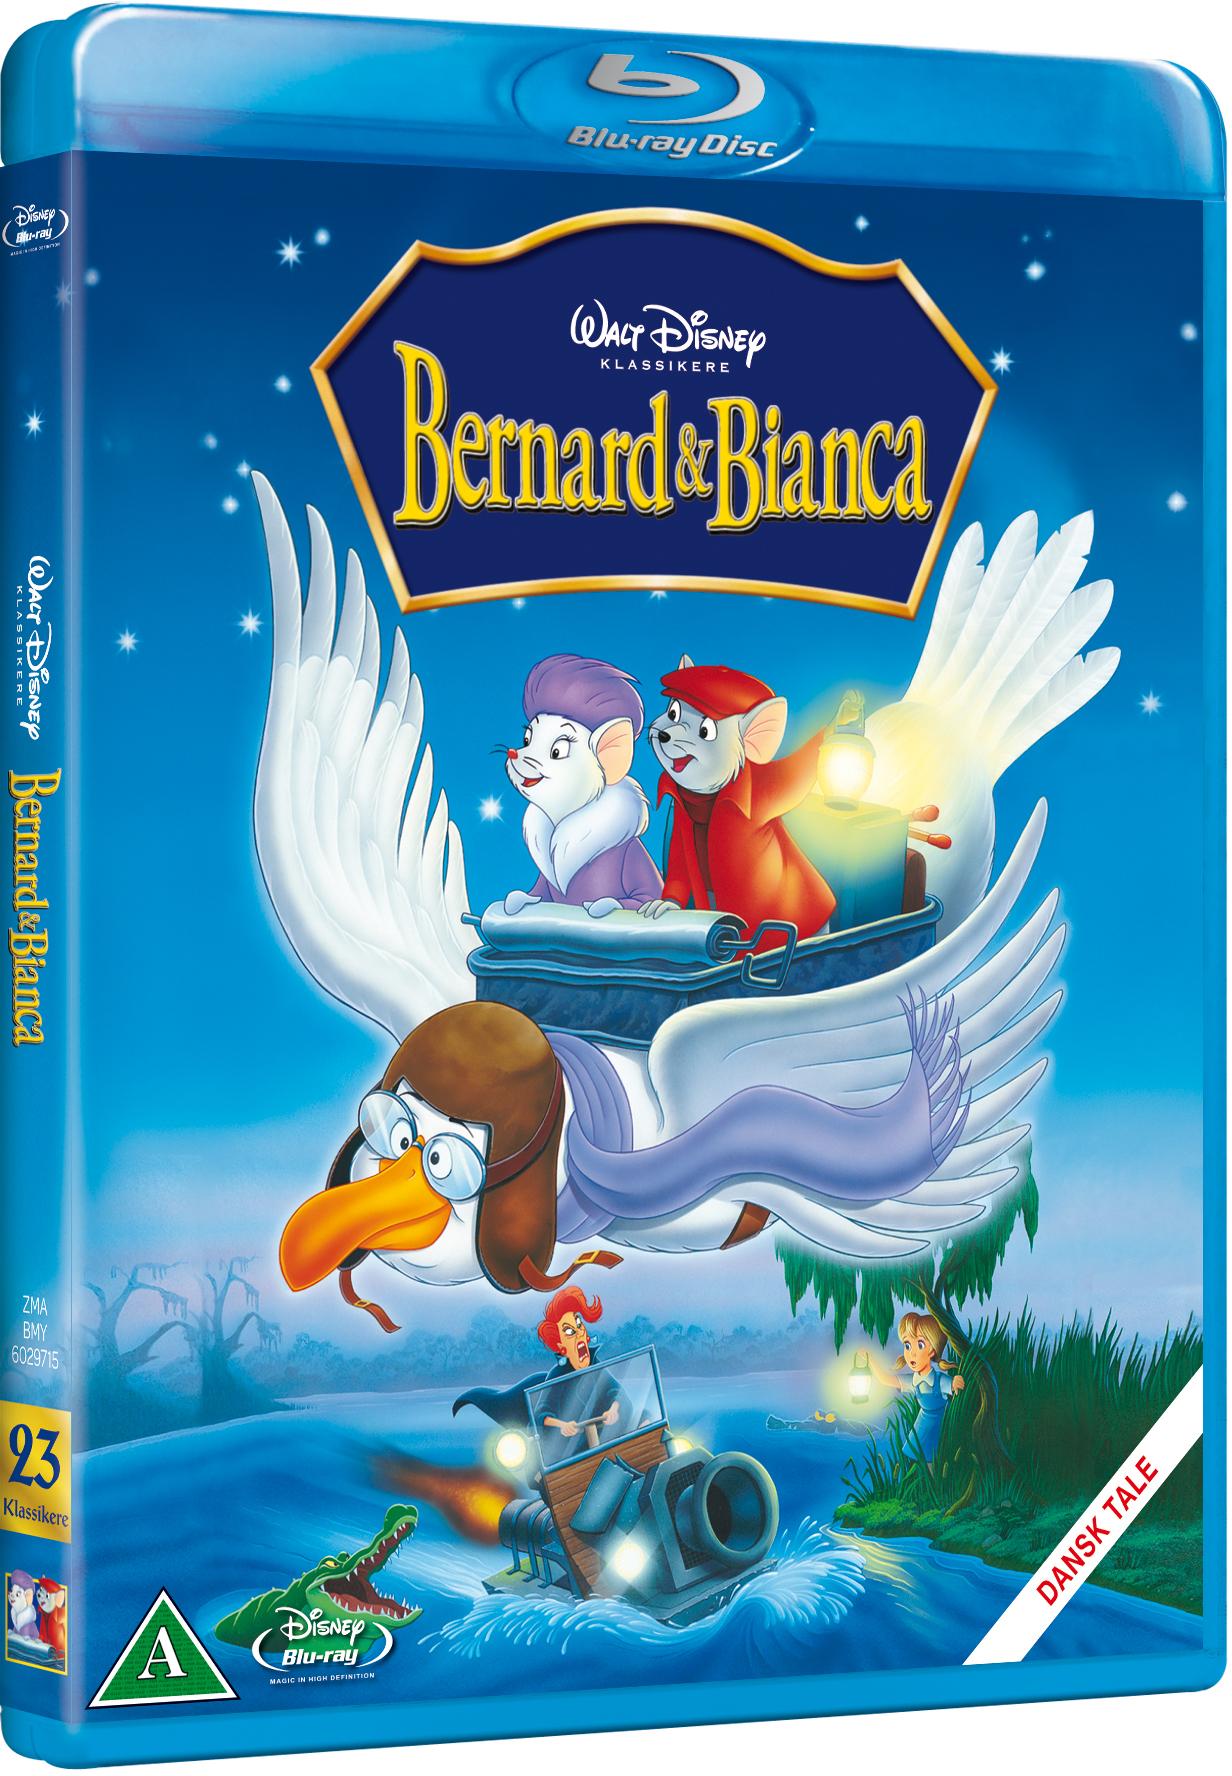 Bernard & Bianca Disney classic #23